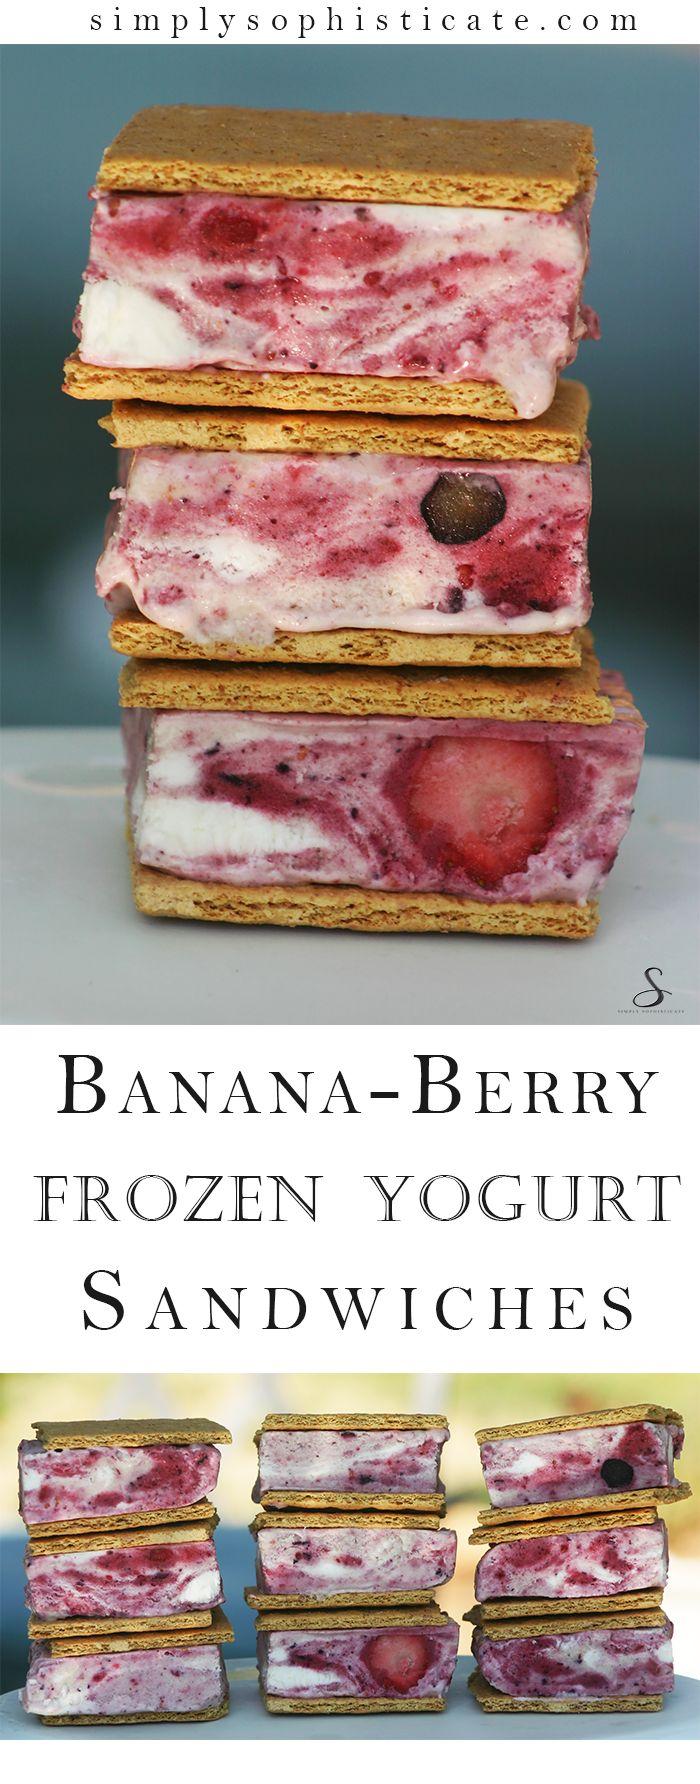 Banana Berry Frozen Yogurt Sandwiches